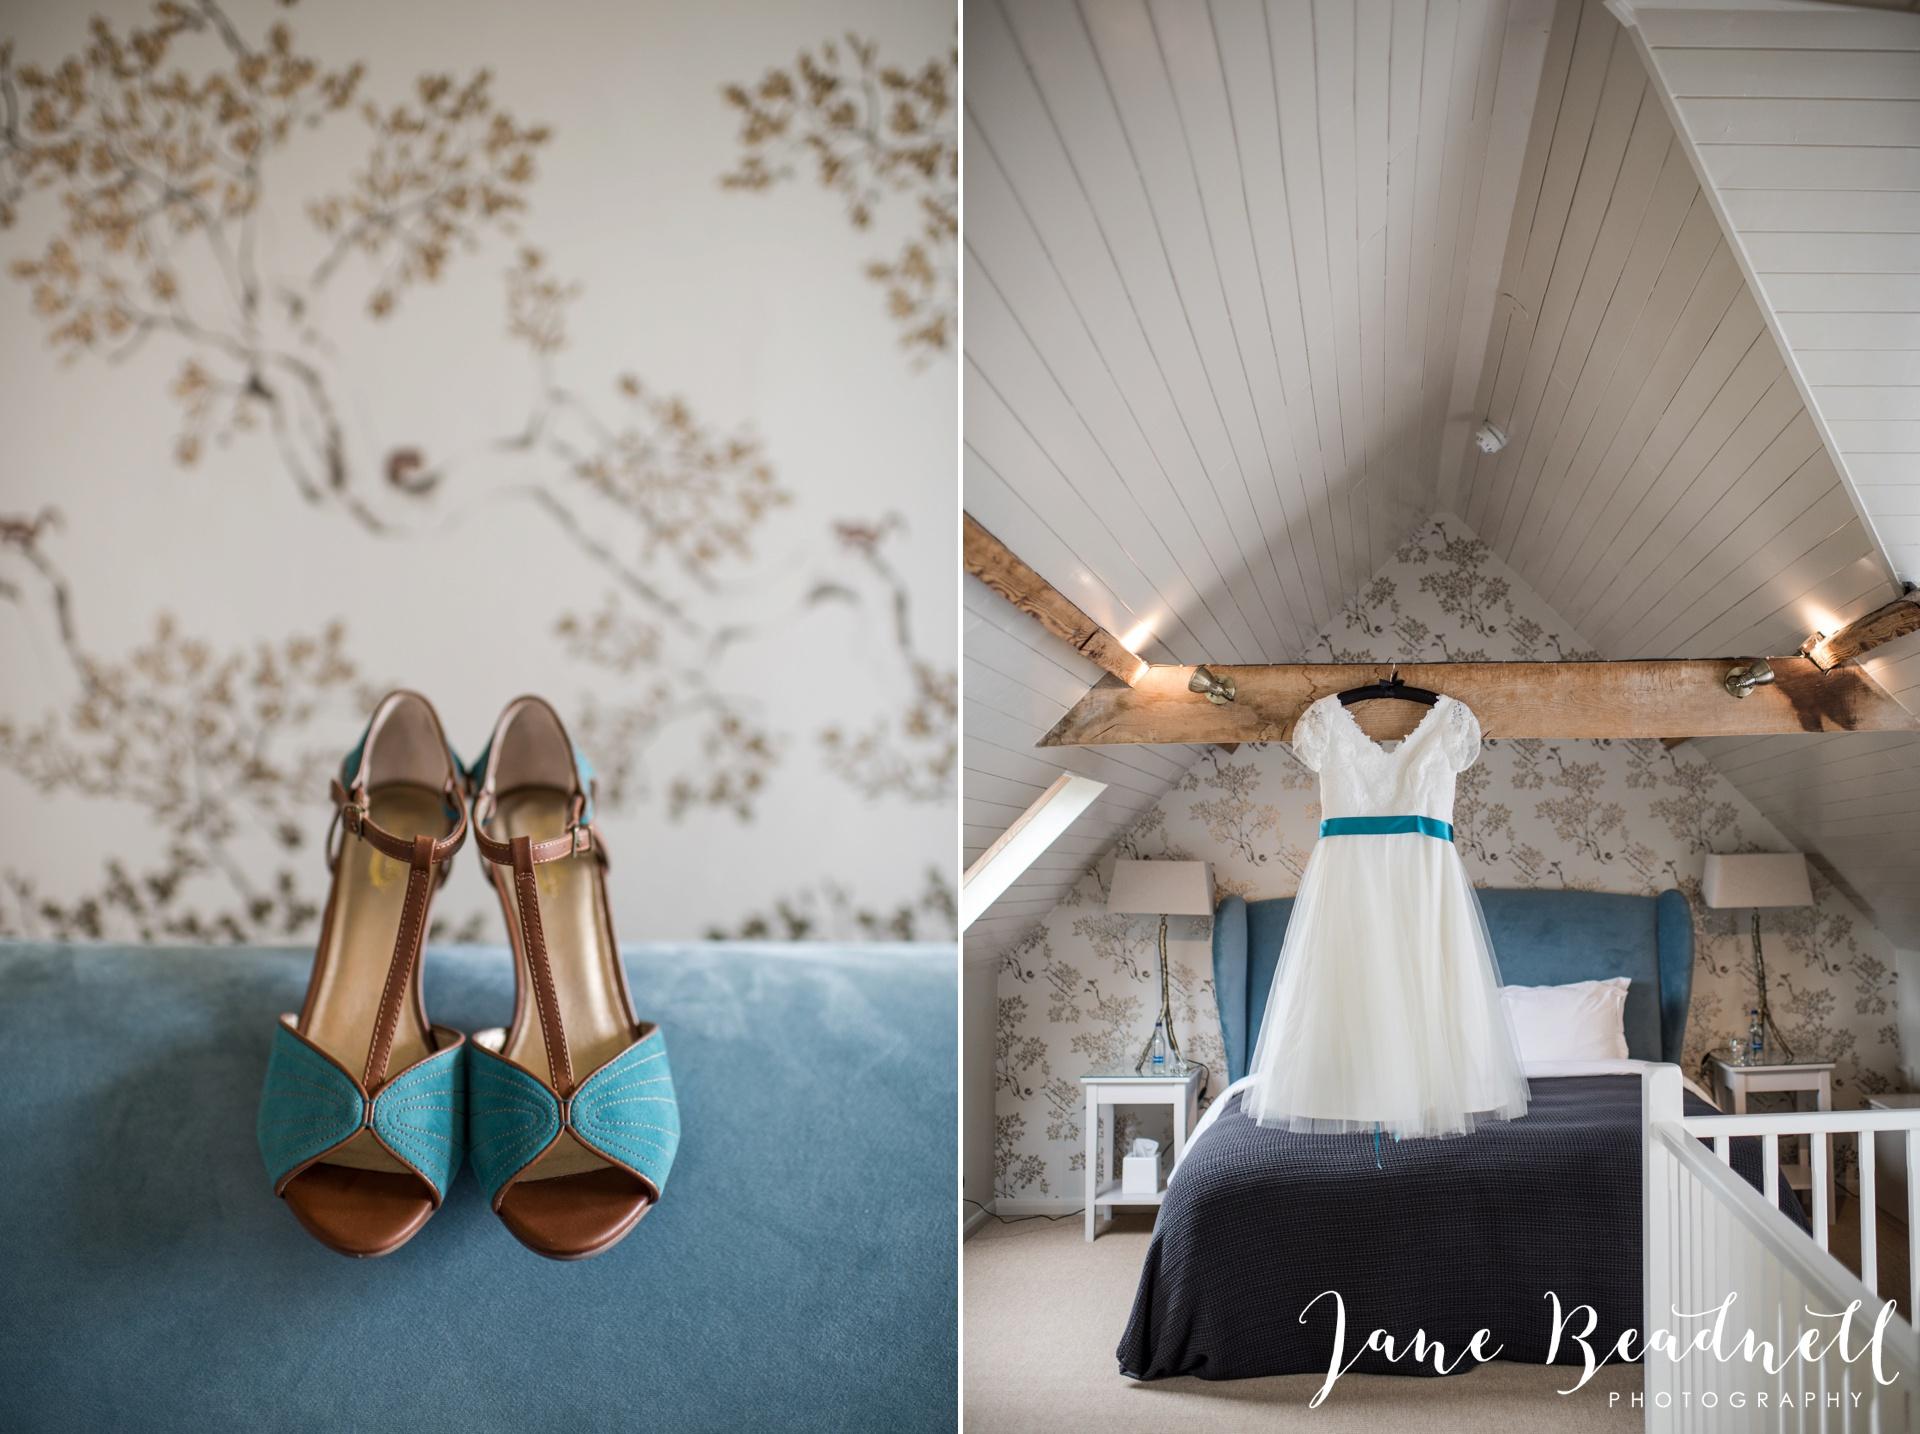 South Farm Wedding photography Hertfordshire by Jane Beadnell Photography fine art wedding photographer_0004